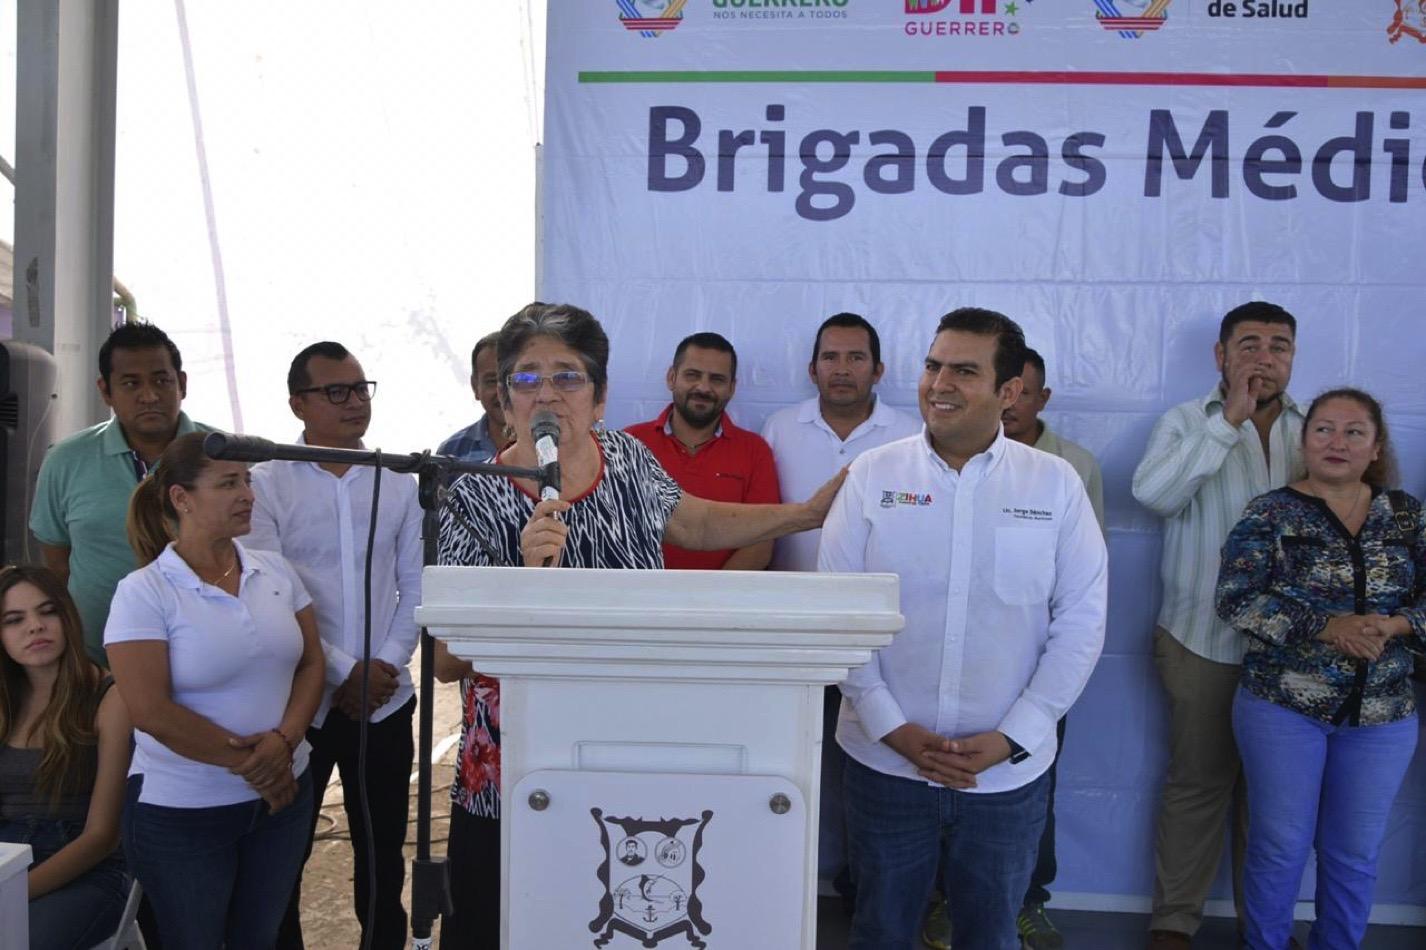 brigadas-medicas-pantla-zihuatanejo_001.jpg